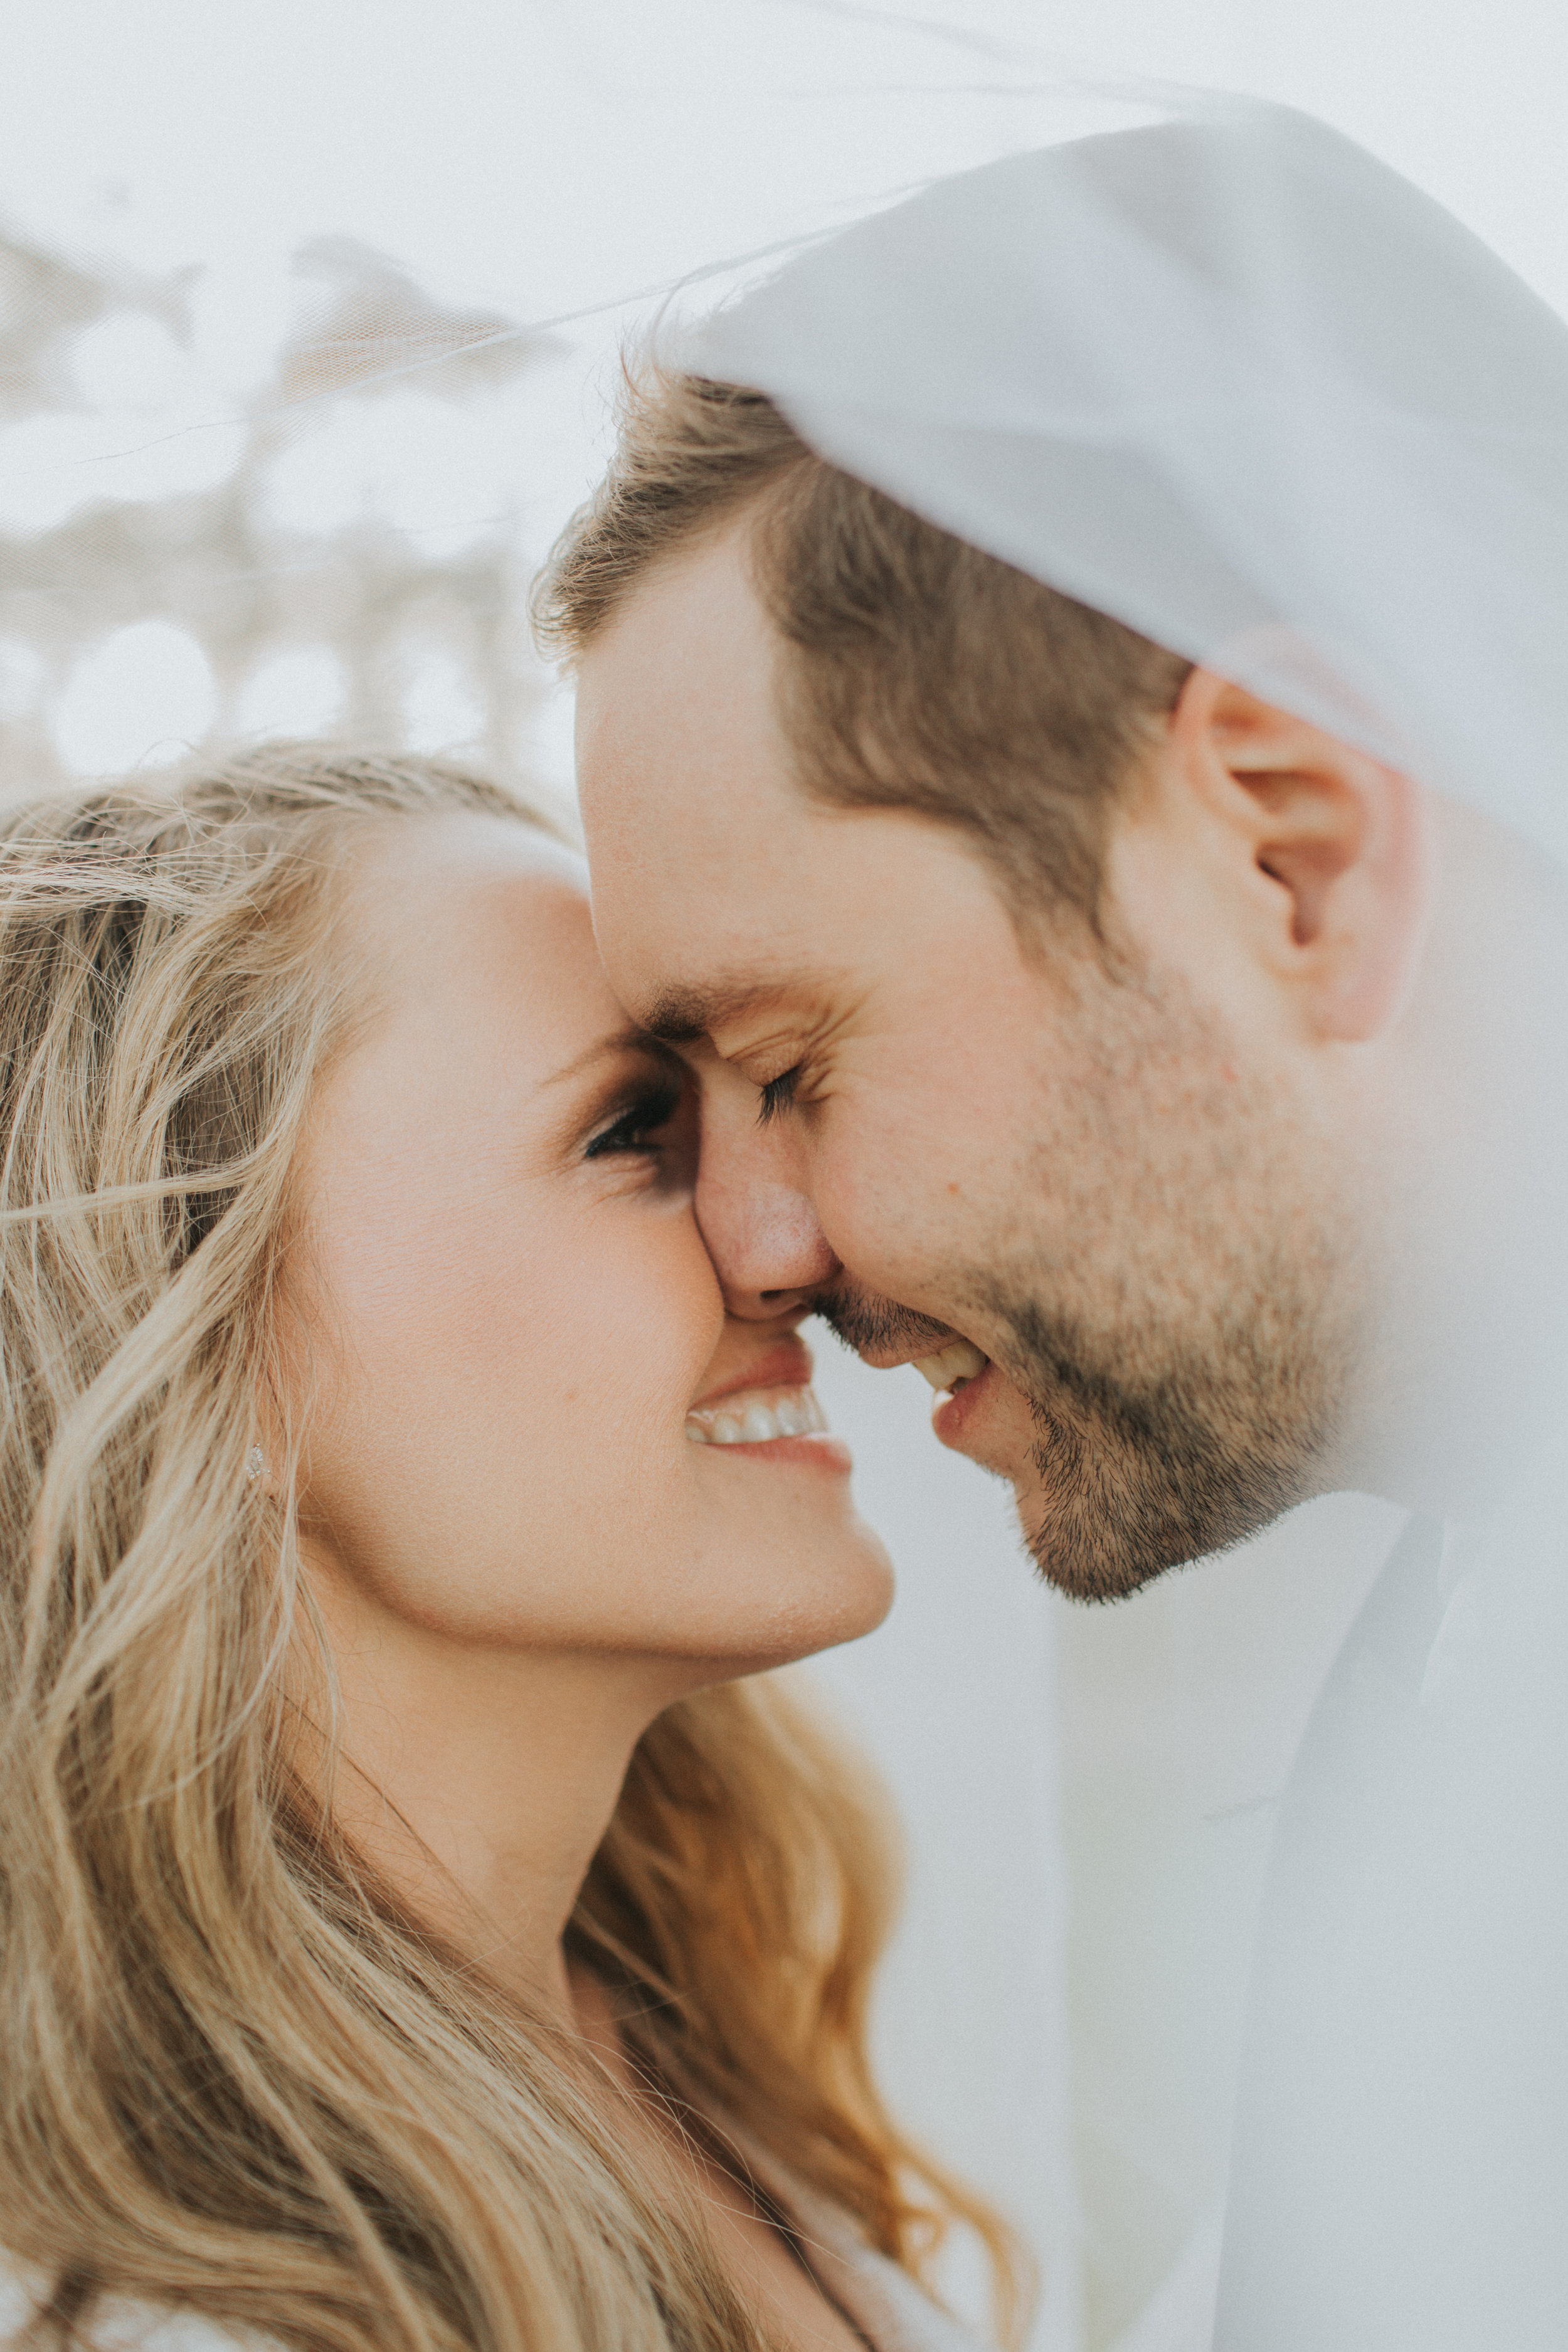 New-Bern-Wedding-Photographer-Christian-Reyes-Photography-1-2.jpg